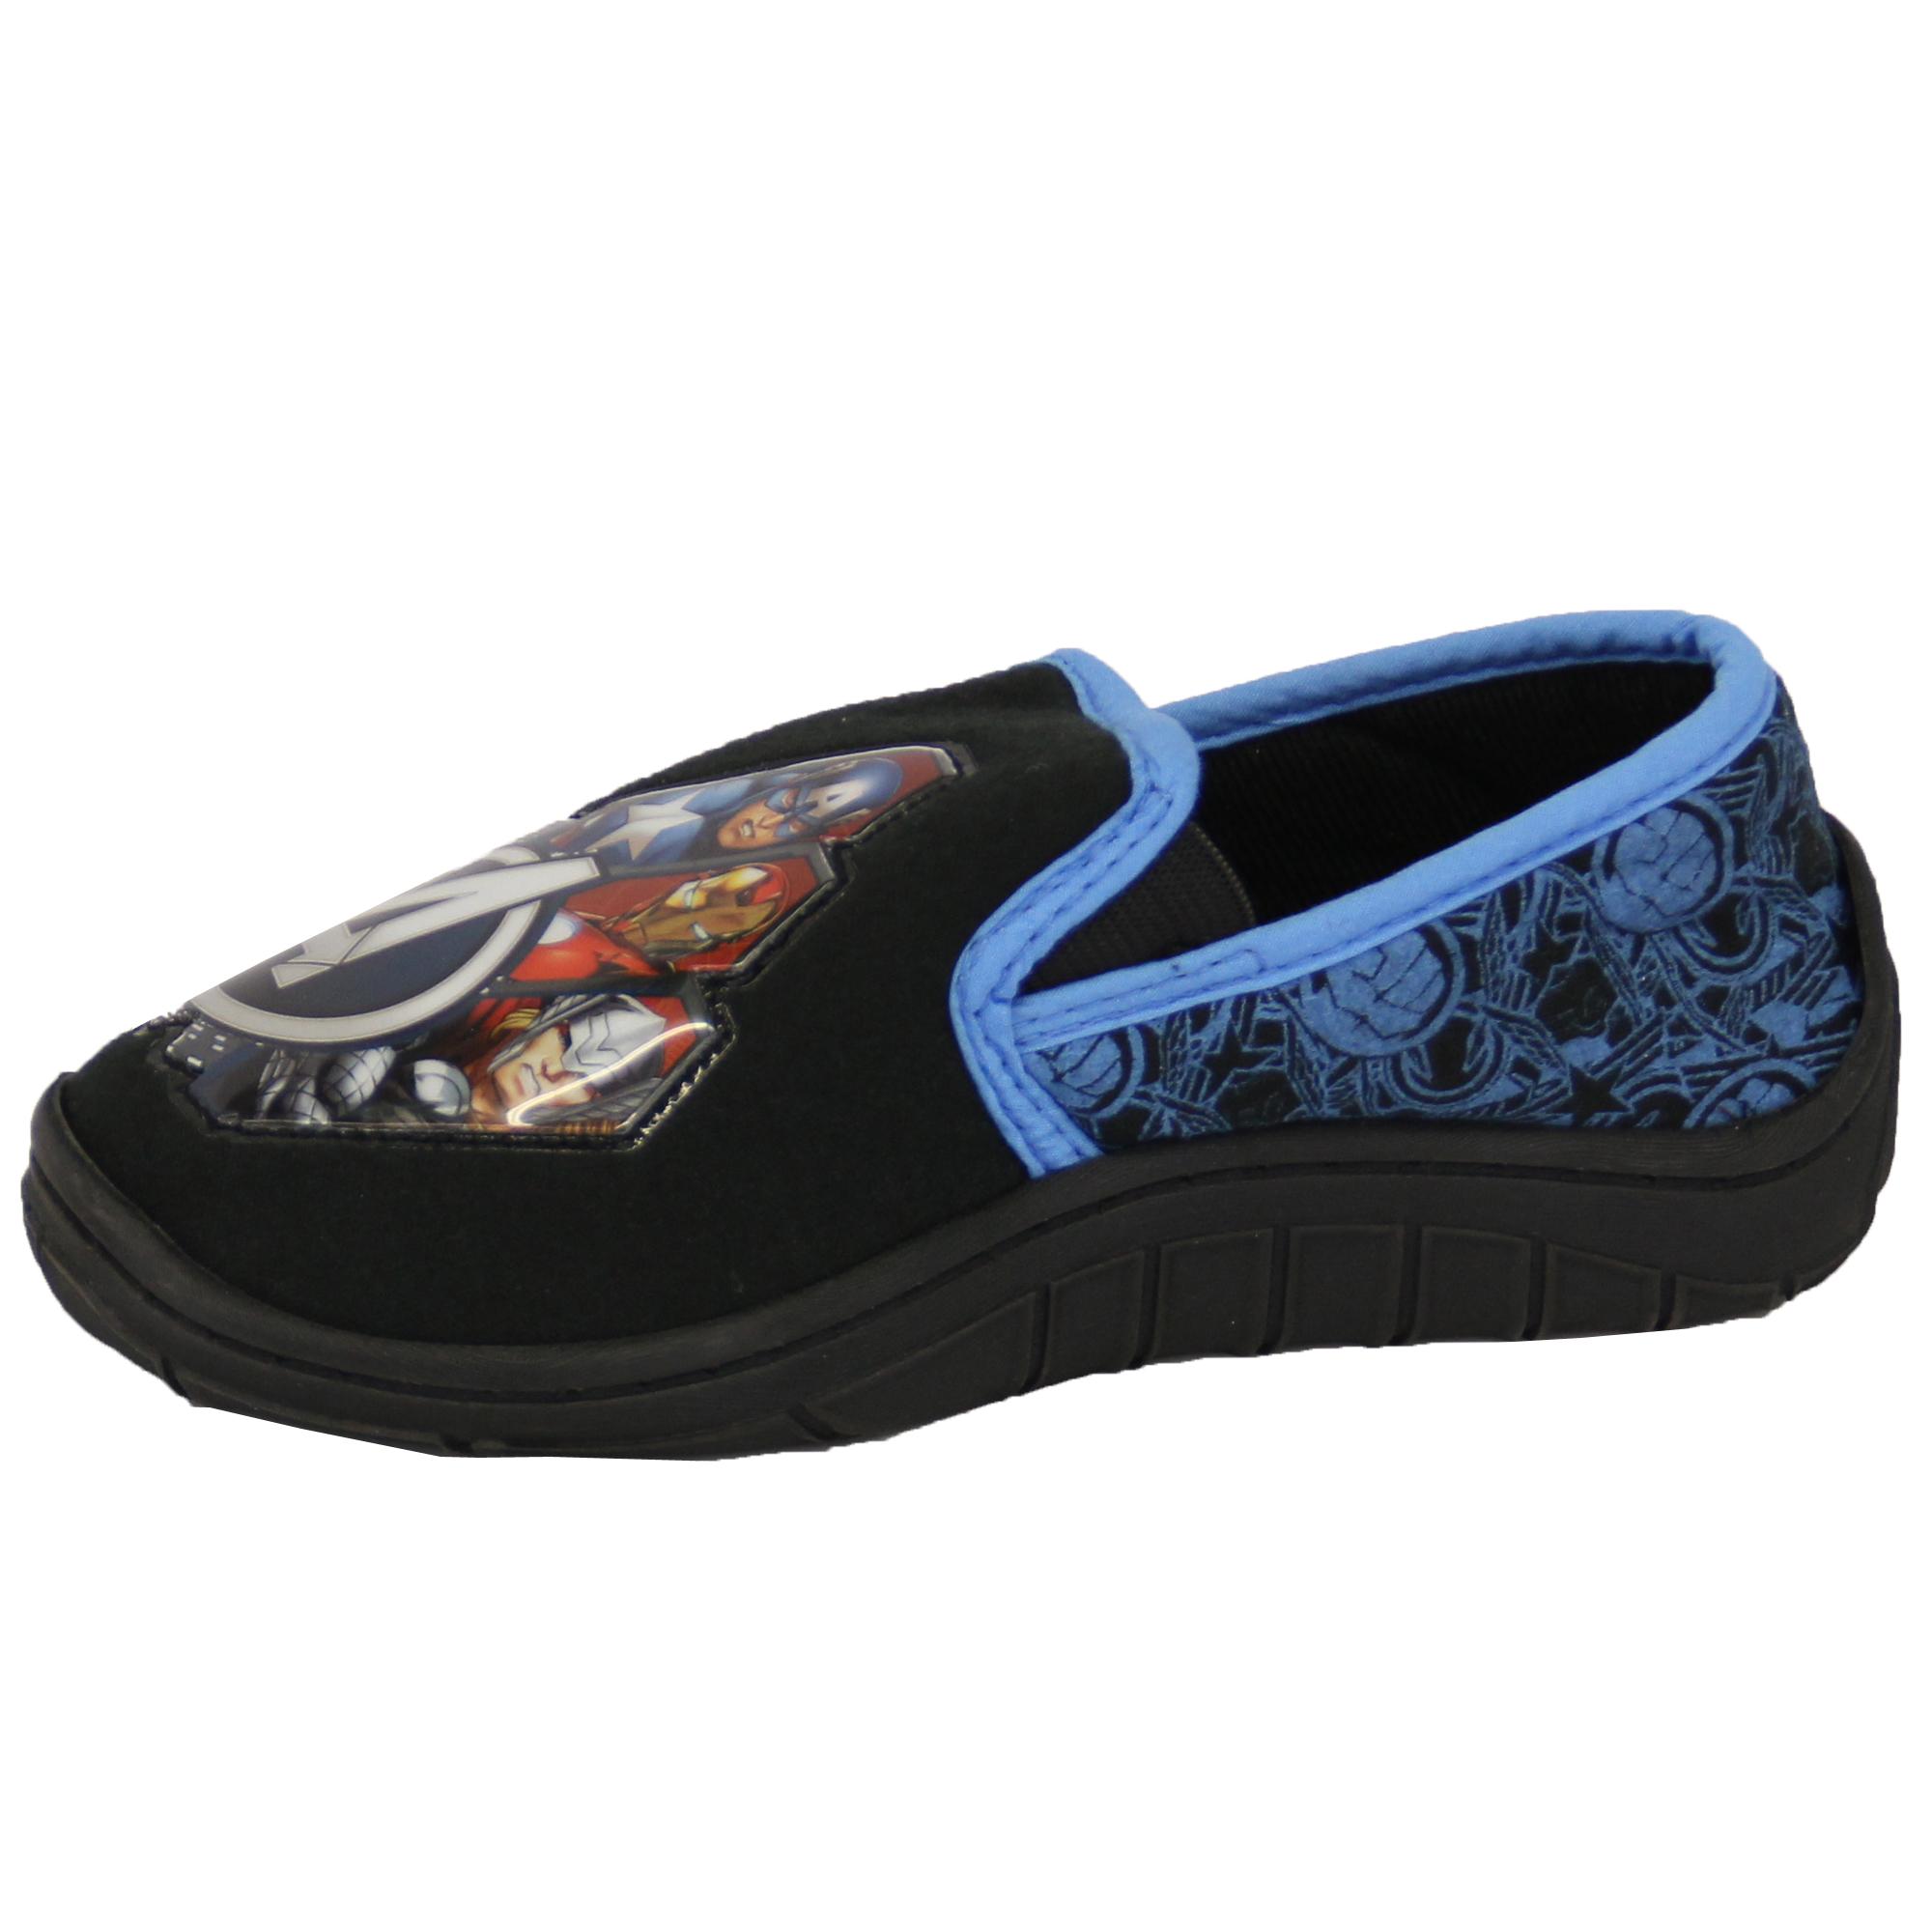 Boys-Girls-Shoes-Minion-Kids-Trainers-Star-Wars-Disney-Spiderman-Slipper thumbnail 7